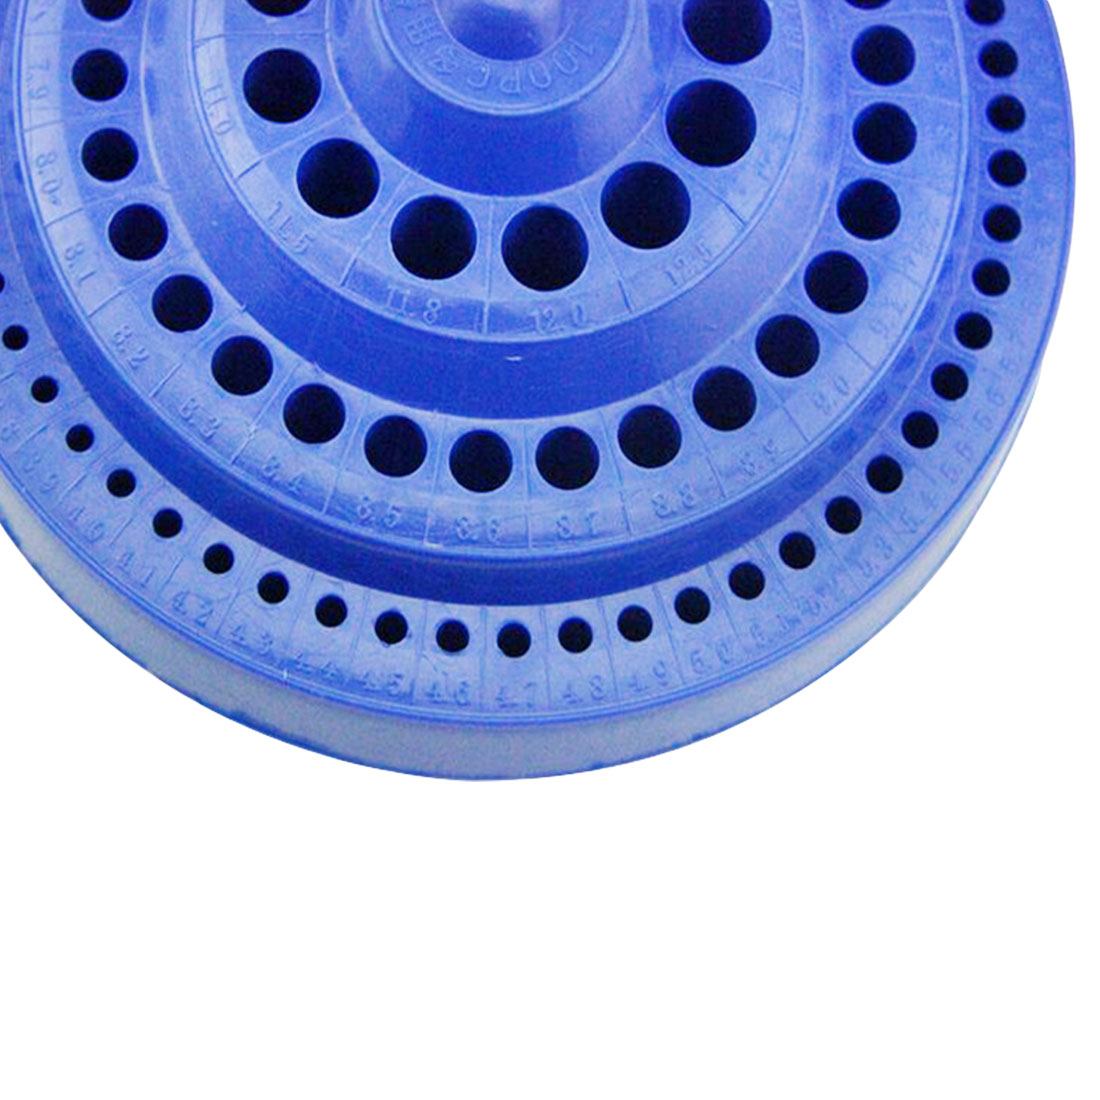 Купить с кэшбэком Hot 1pcs Round Shape Plastic Hard 100pcs 1-13mm Drill Bit Storage Case Blue